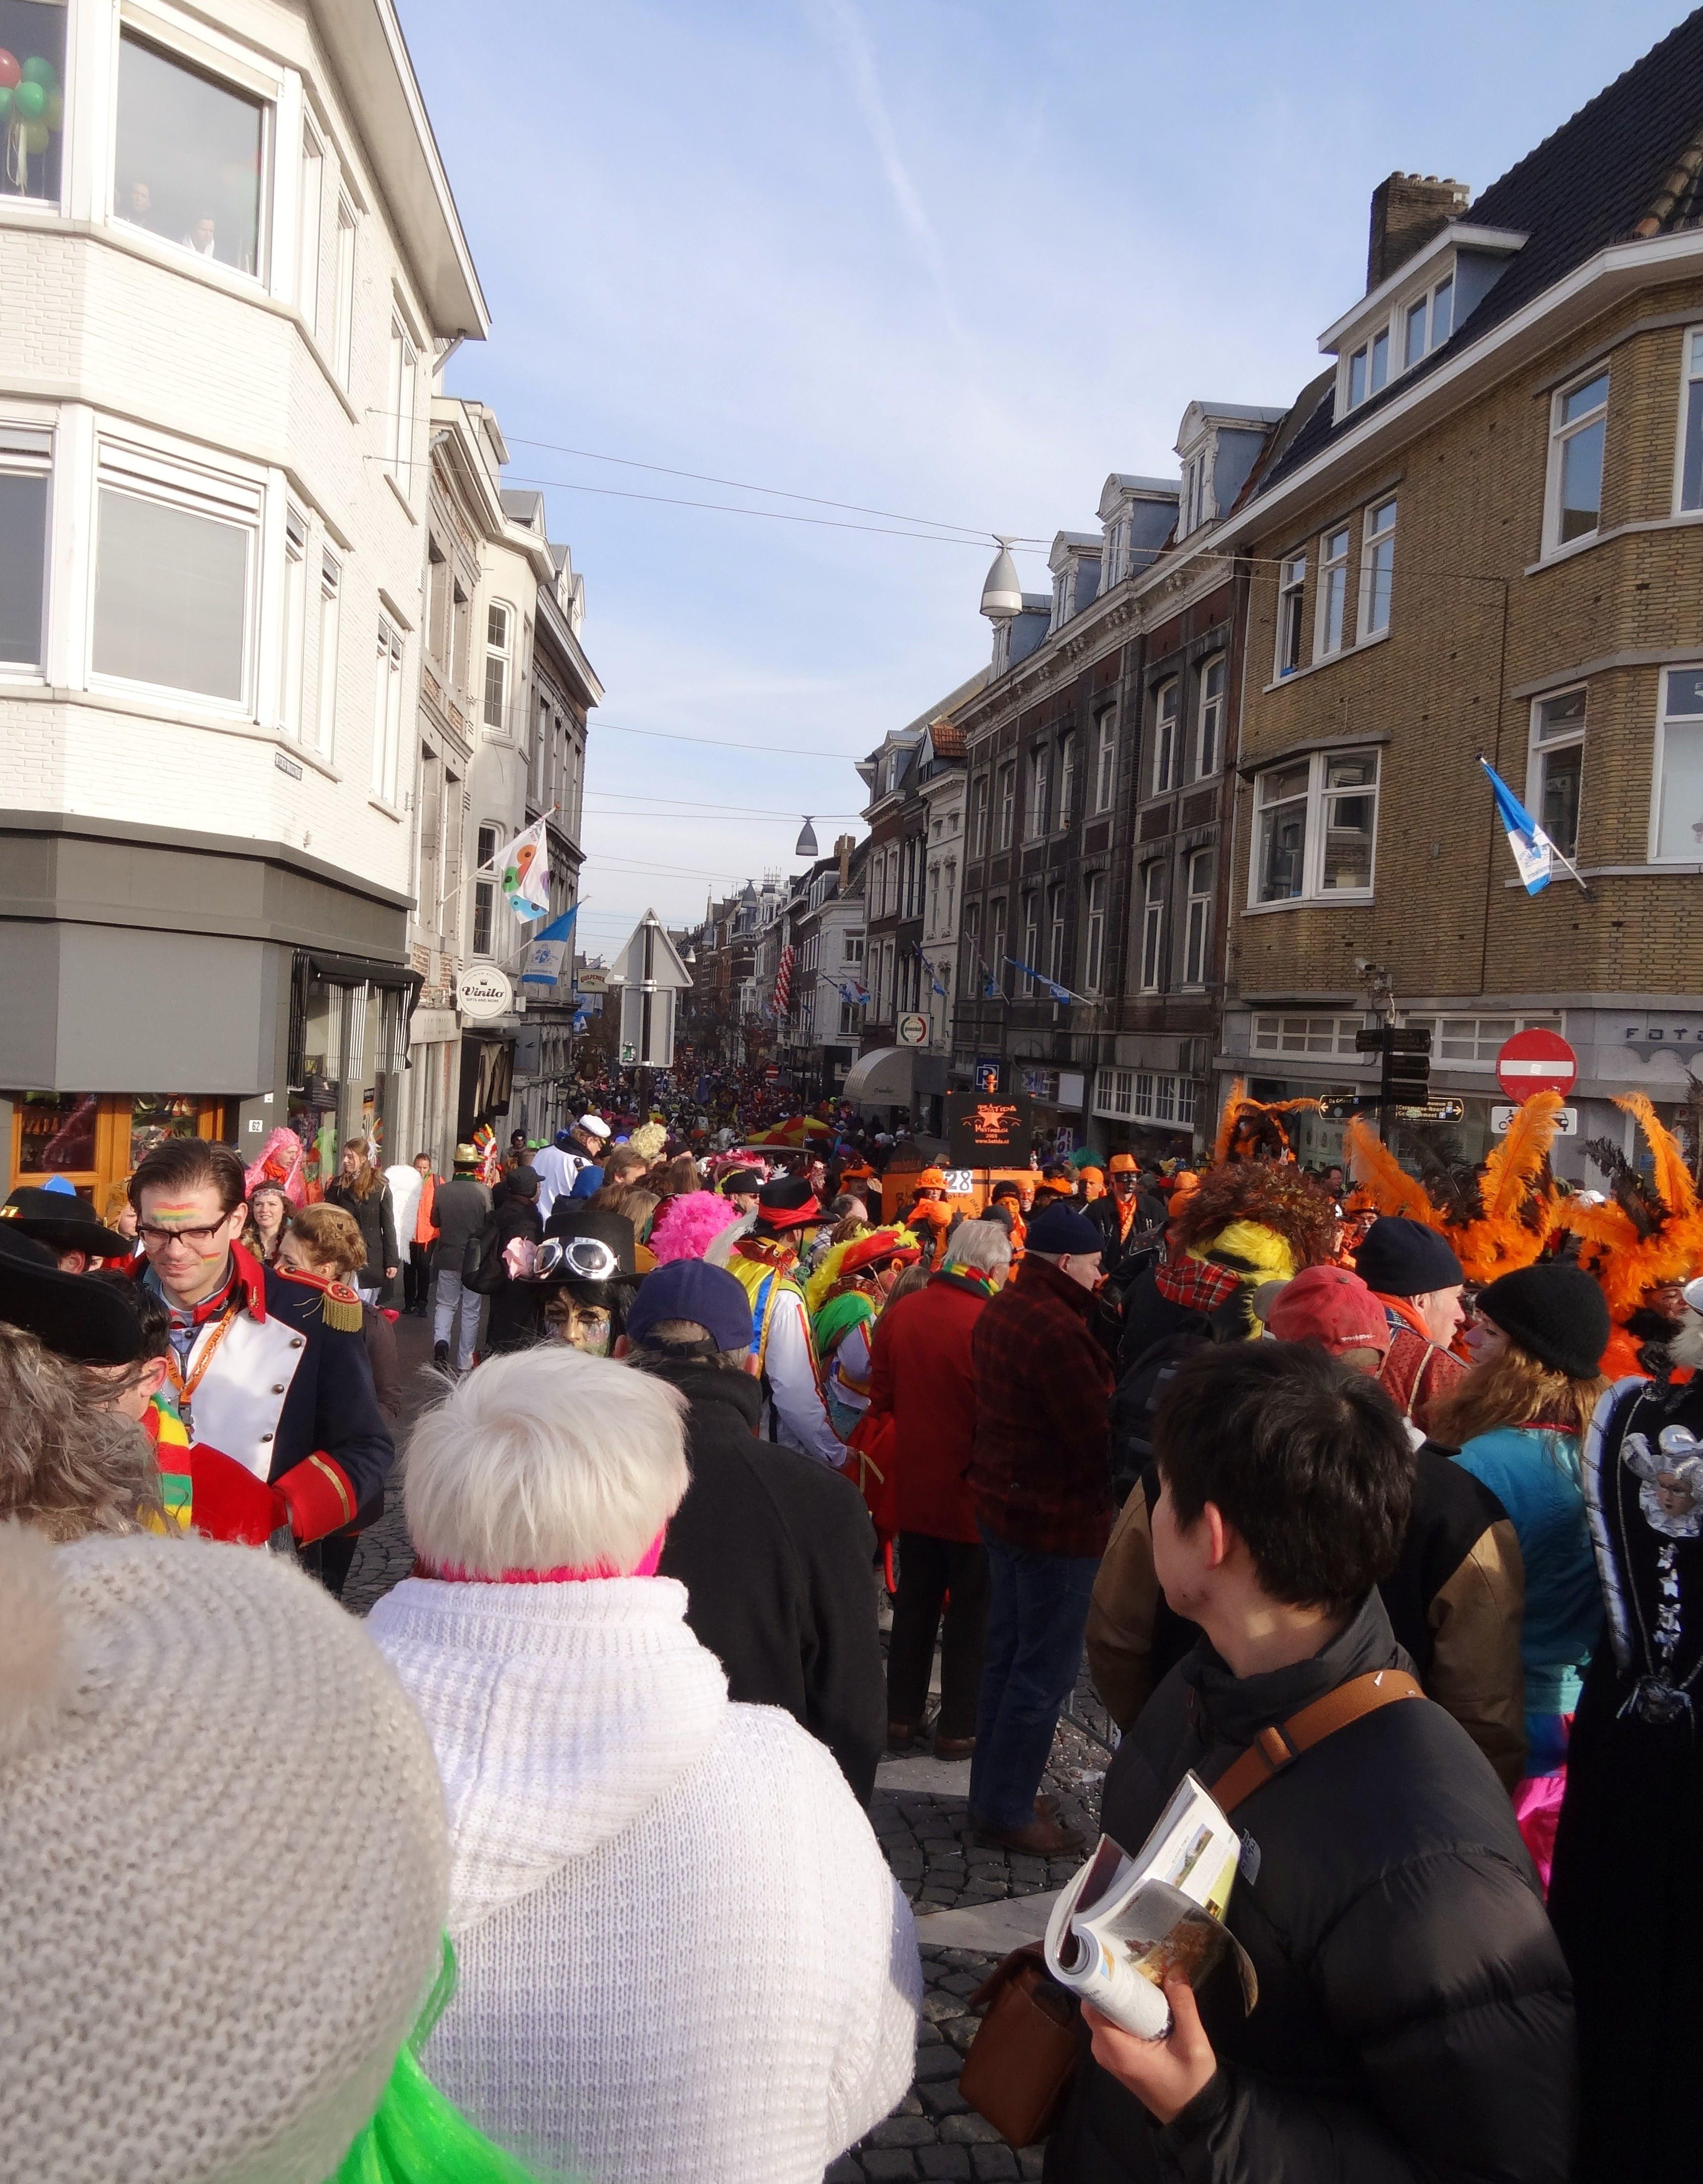 Carnaval de MaastrichtCrédits alexdesourdy